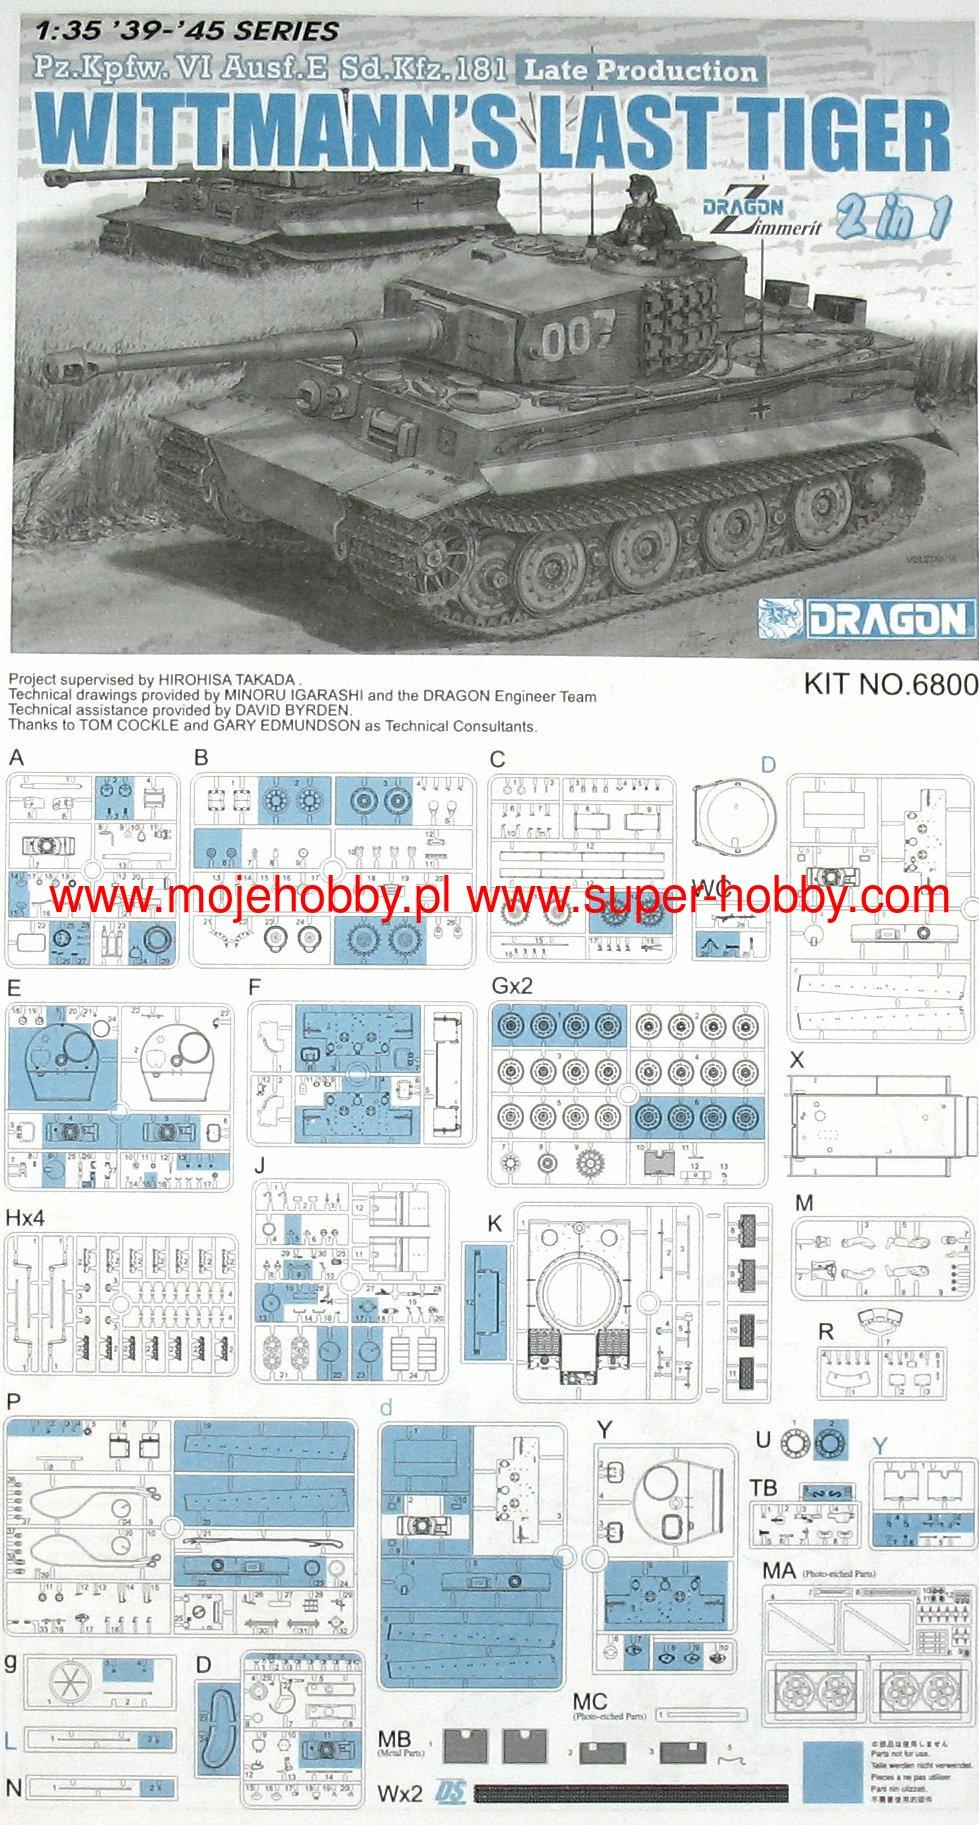 Pz.Kpfw VI Ausf.E Sd.Kfz.181 Wittmann/'s Last Tiger 1:35 Model Kit Dragon 6800